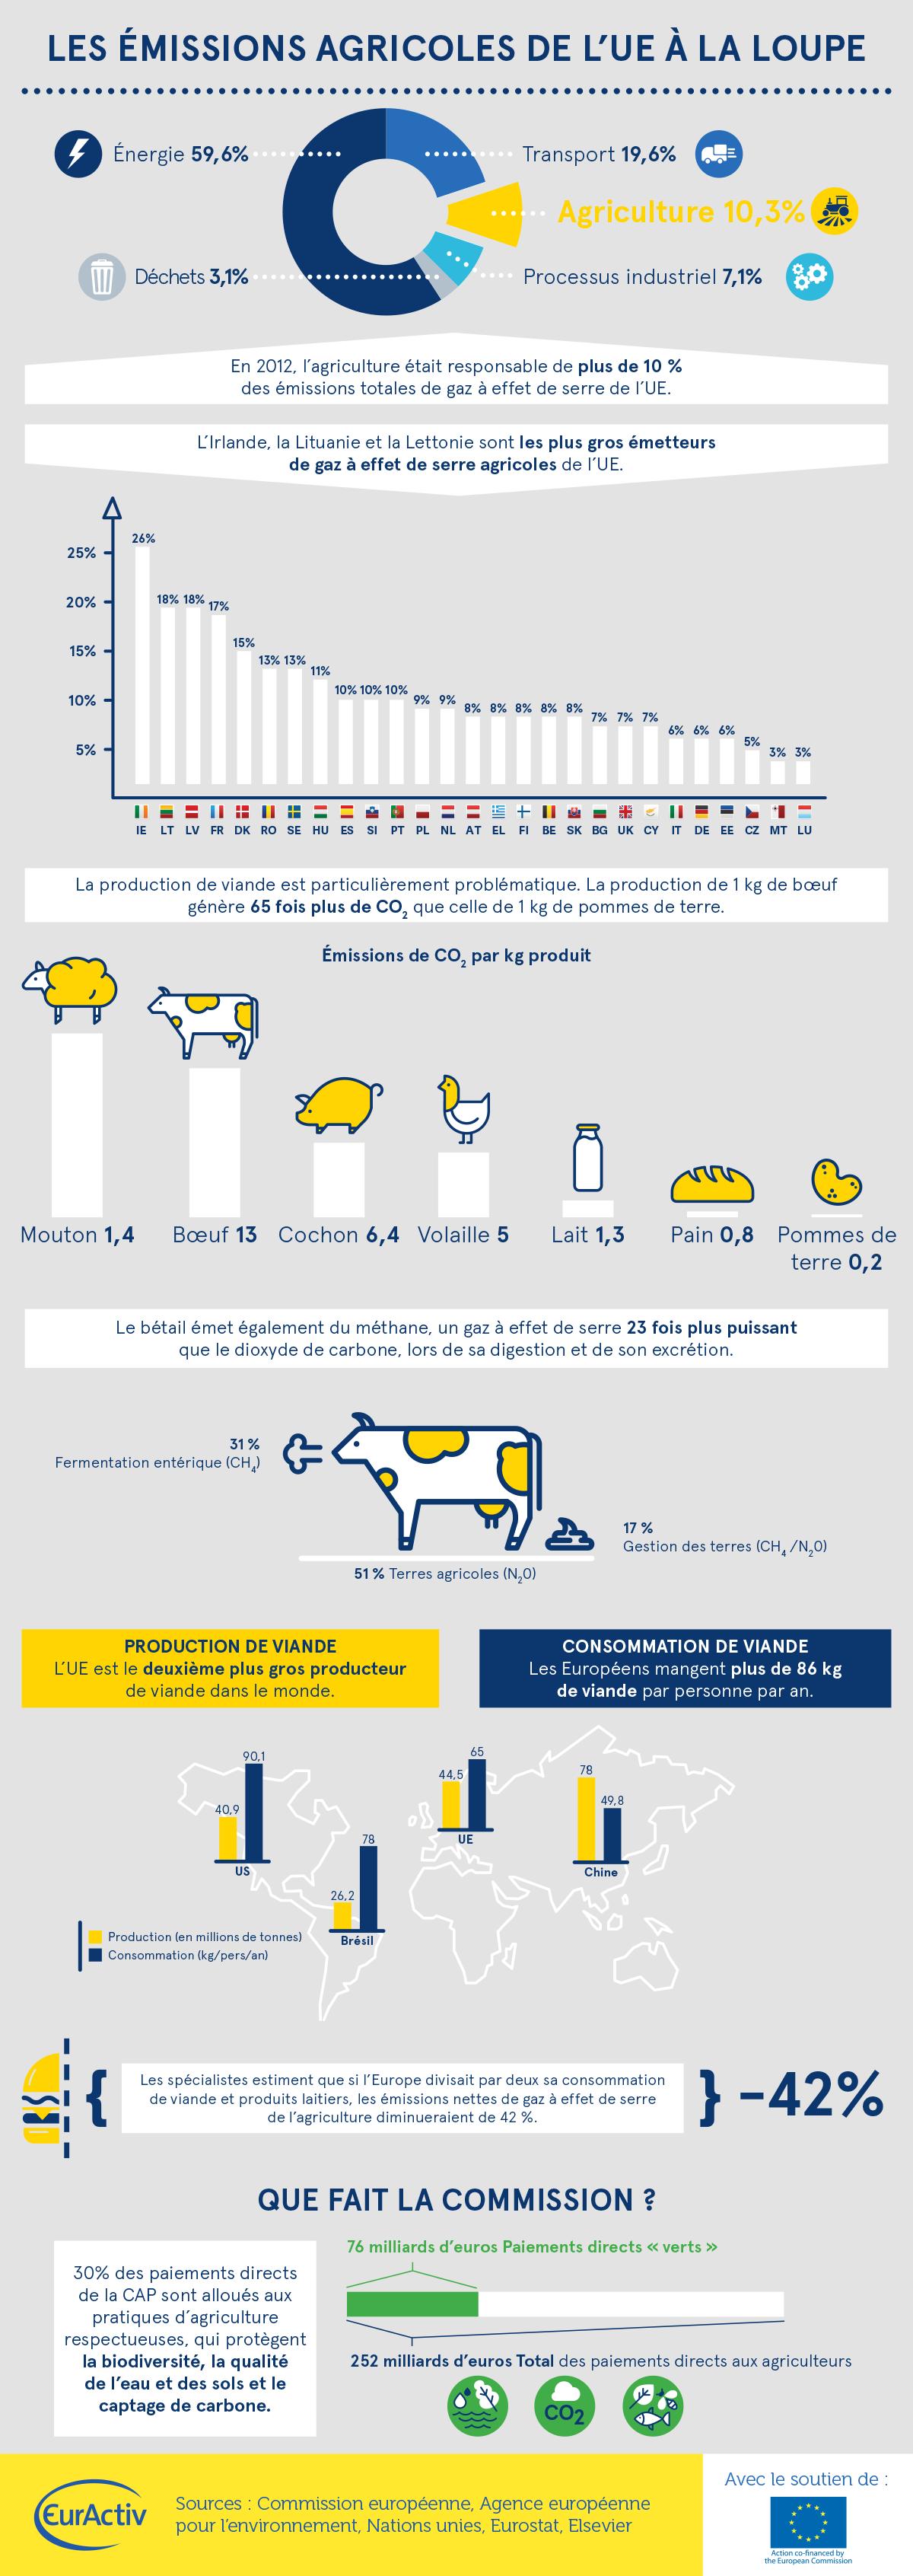 Les émissions agricoles de l'UE